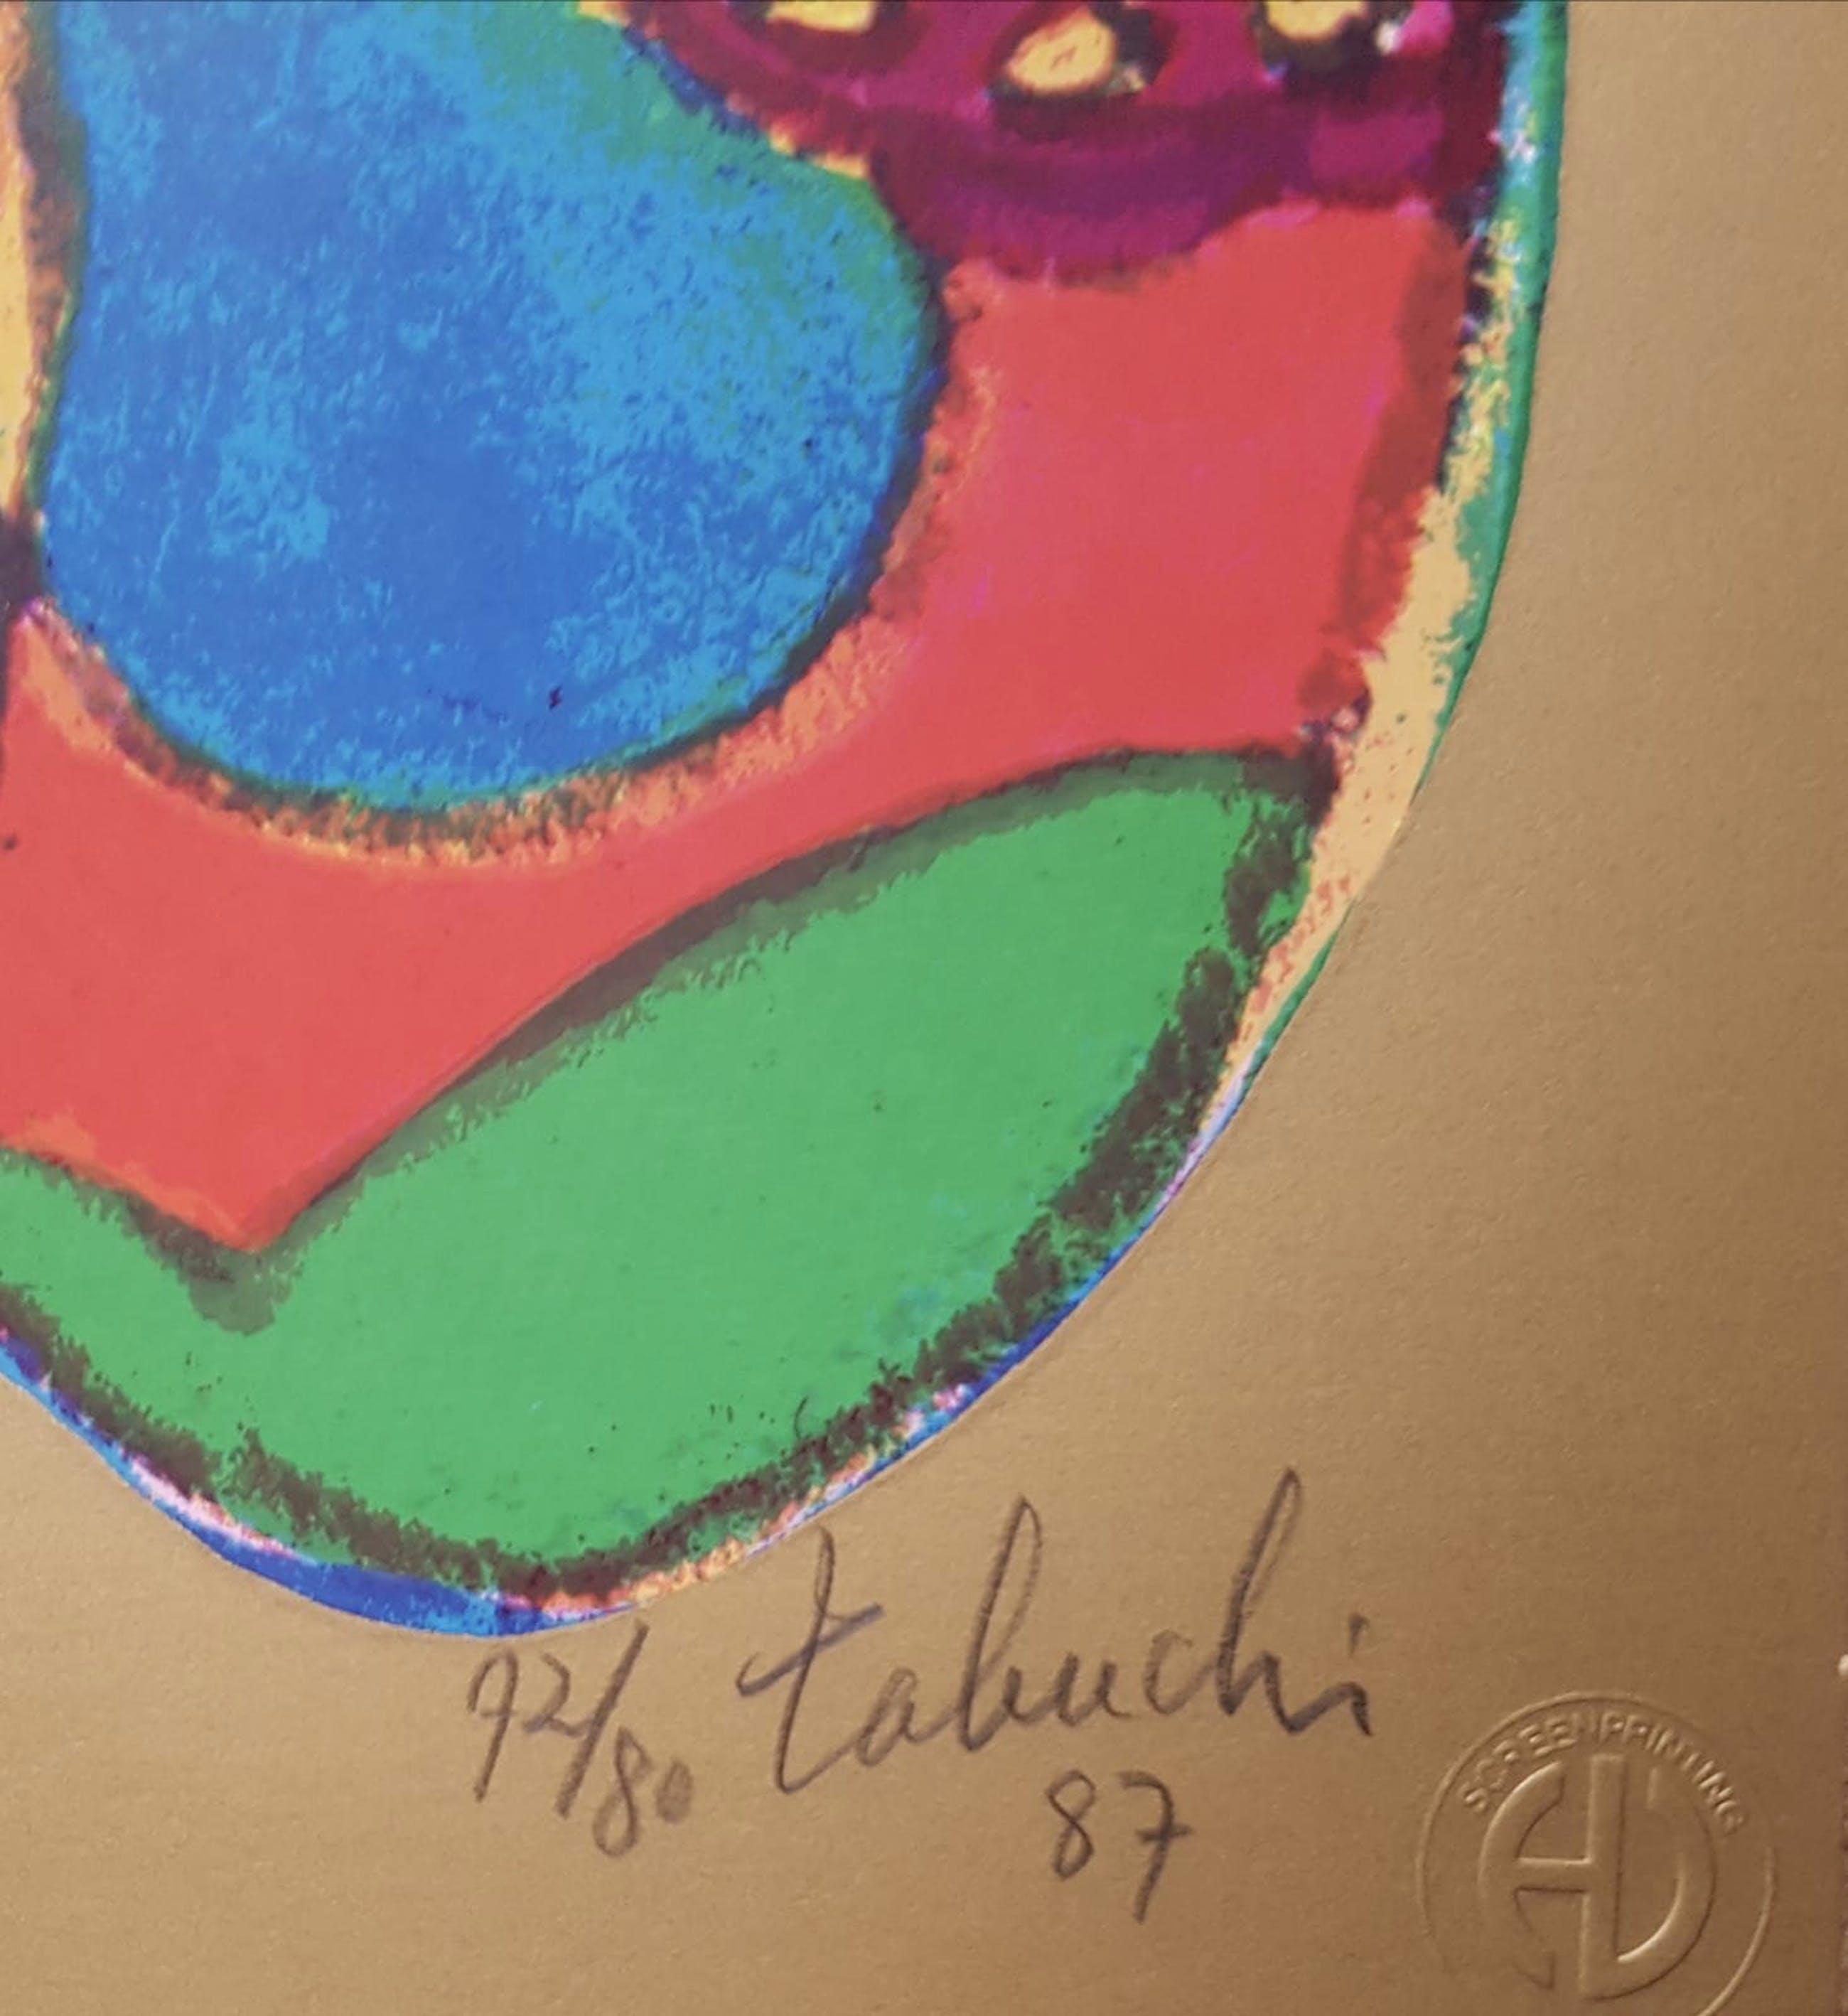 Yasse Tabuchi - Yasse Tabuchi - (1921-2009) 3 x handgesigneerde,genummerde & gedateerde kleurenl kopen? Bied vanaf 30!